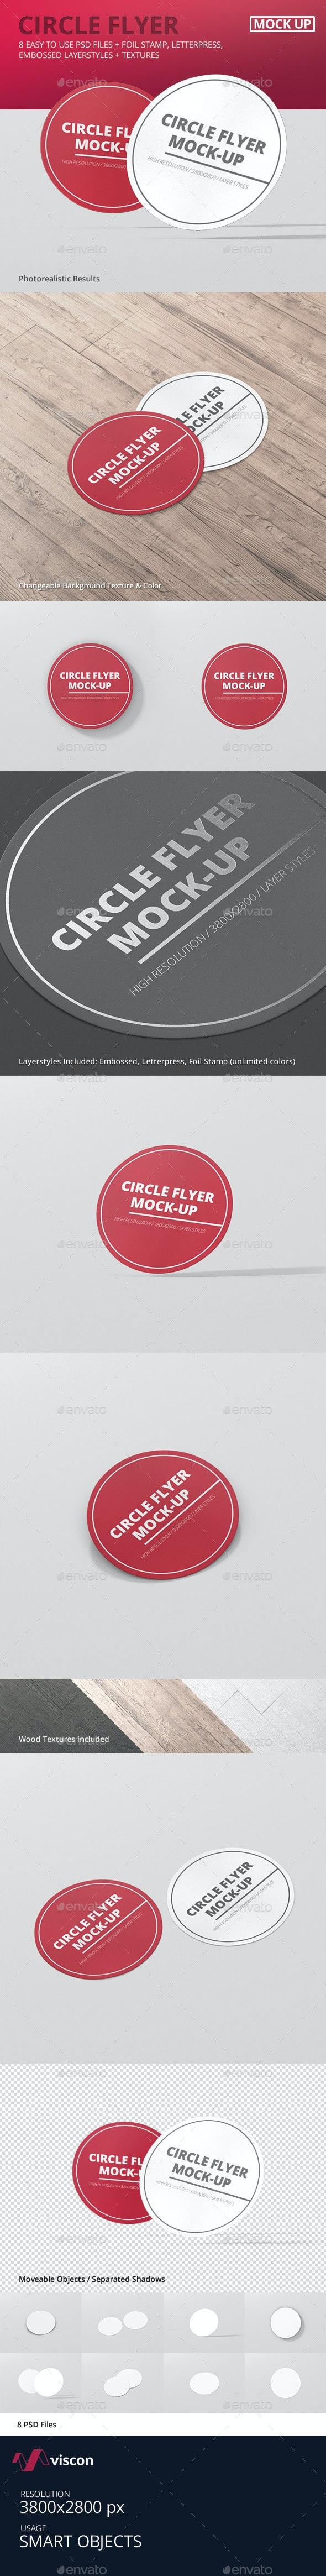 Circle Flyer Mockup - Miscellaneous Print